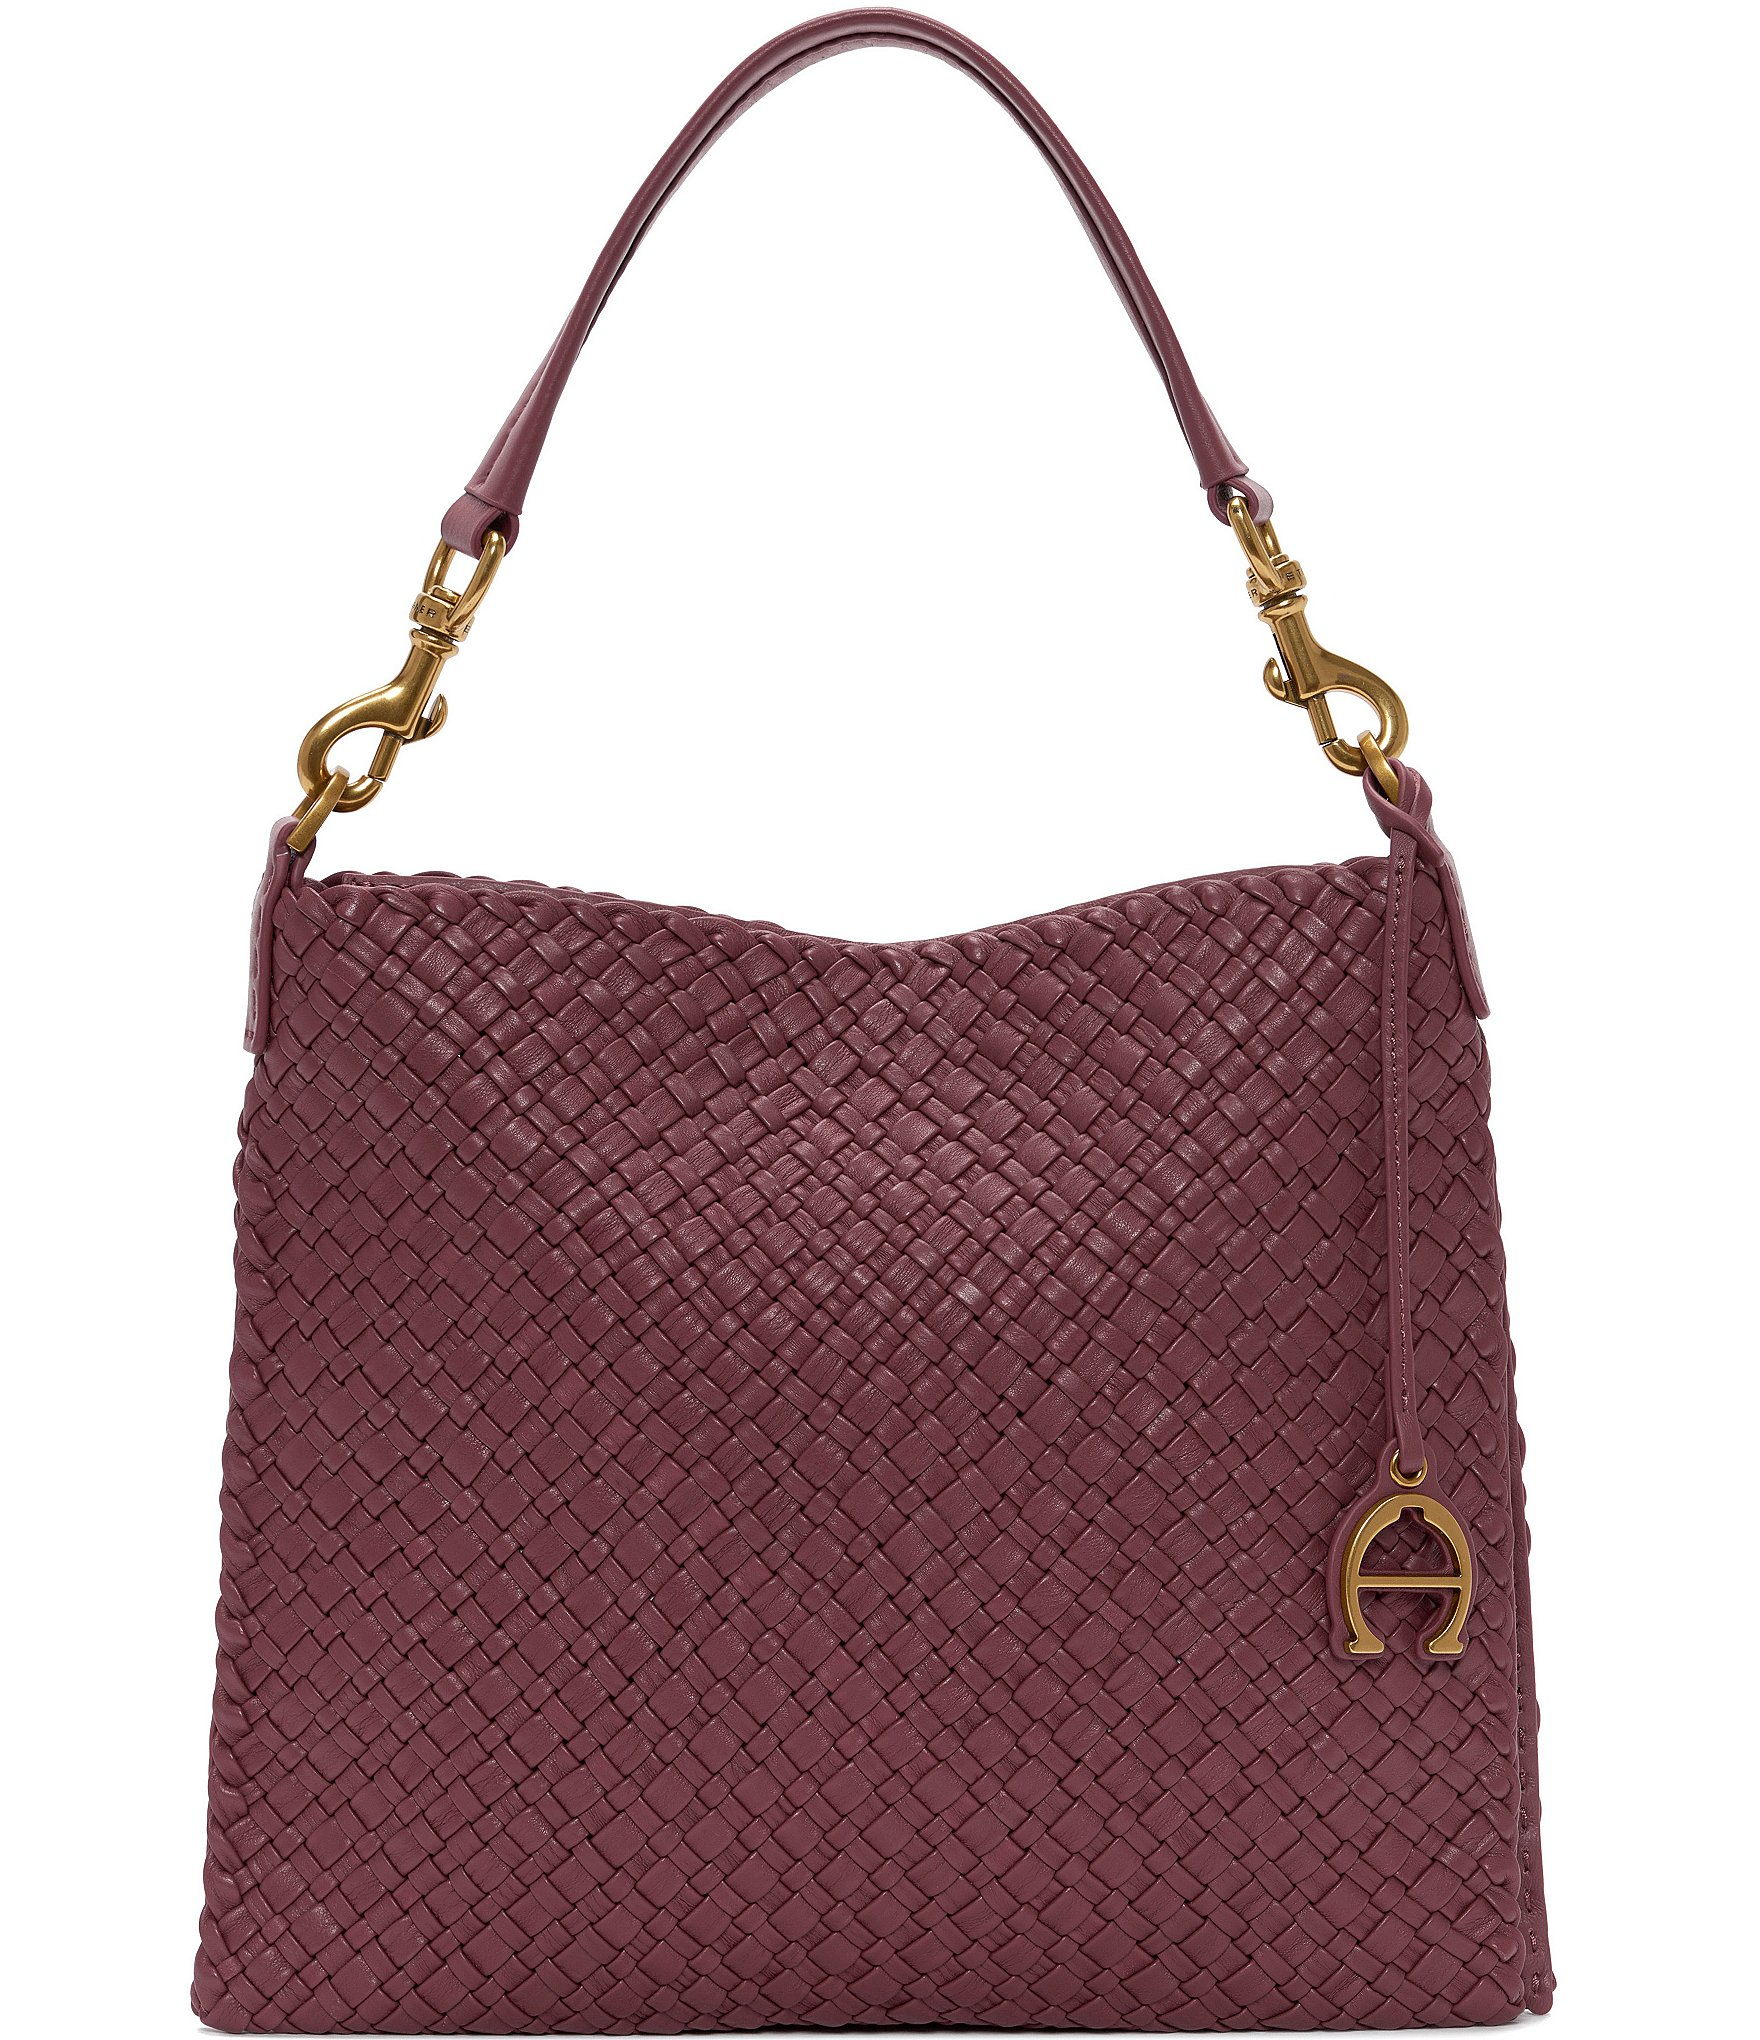 Etienne Aigner Irena Woven Small Hobo Bag | Dillard's